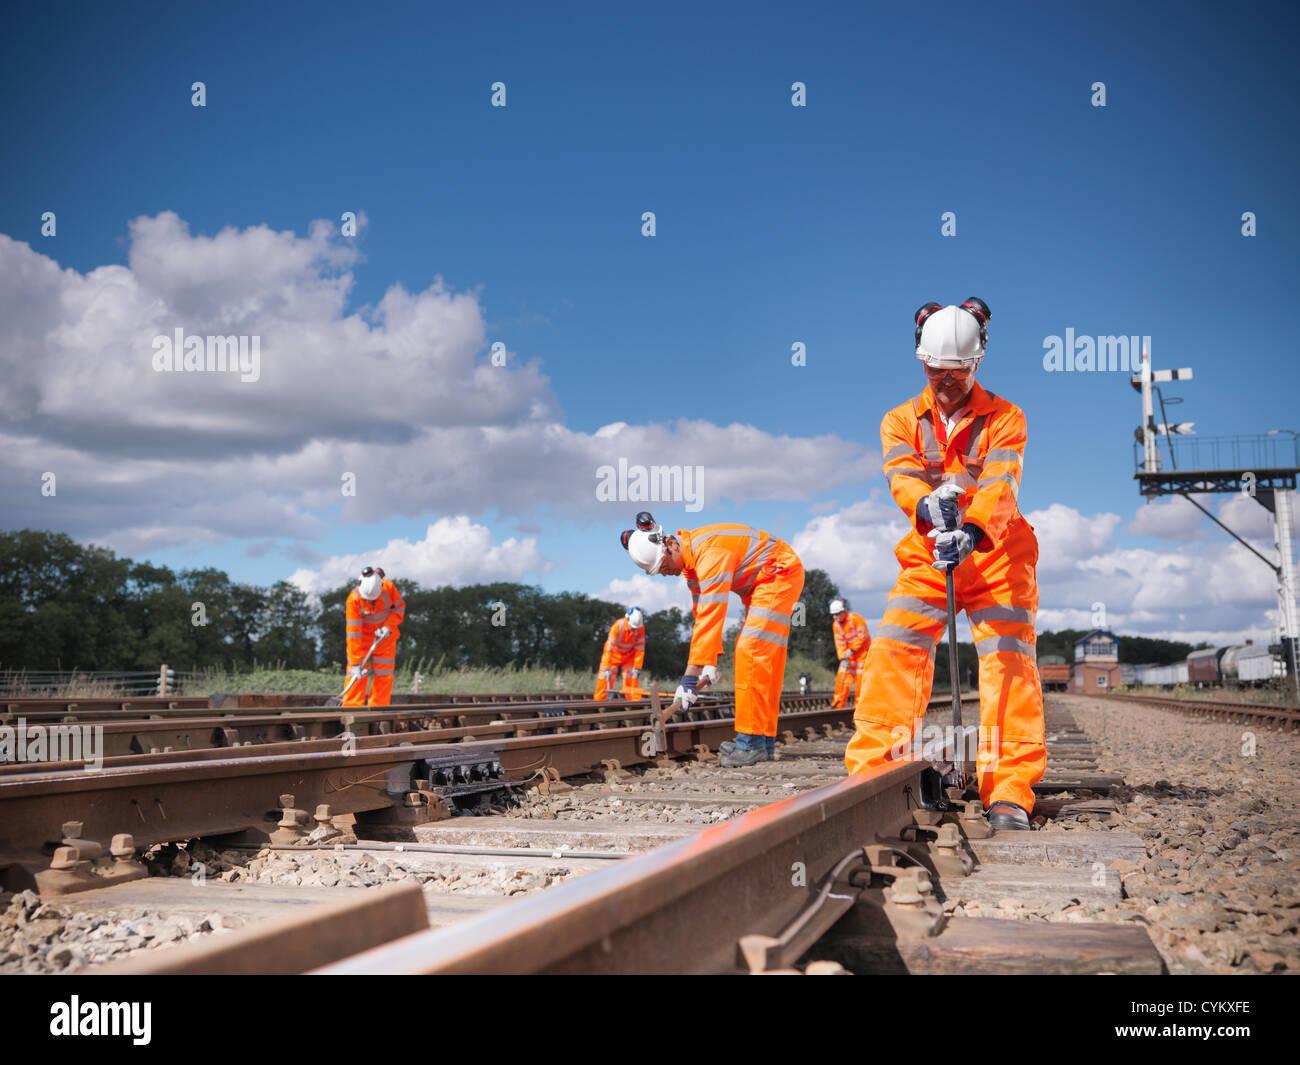 Railway workers adjusting train tracks - Stock Image